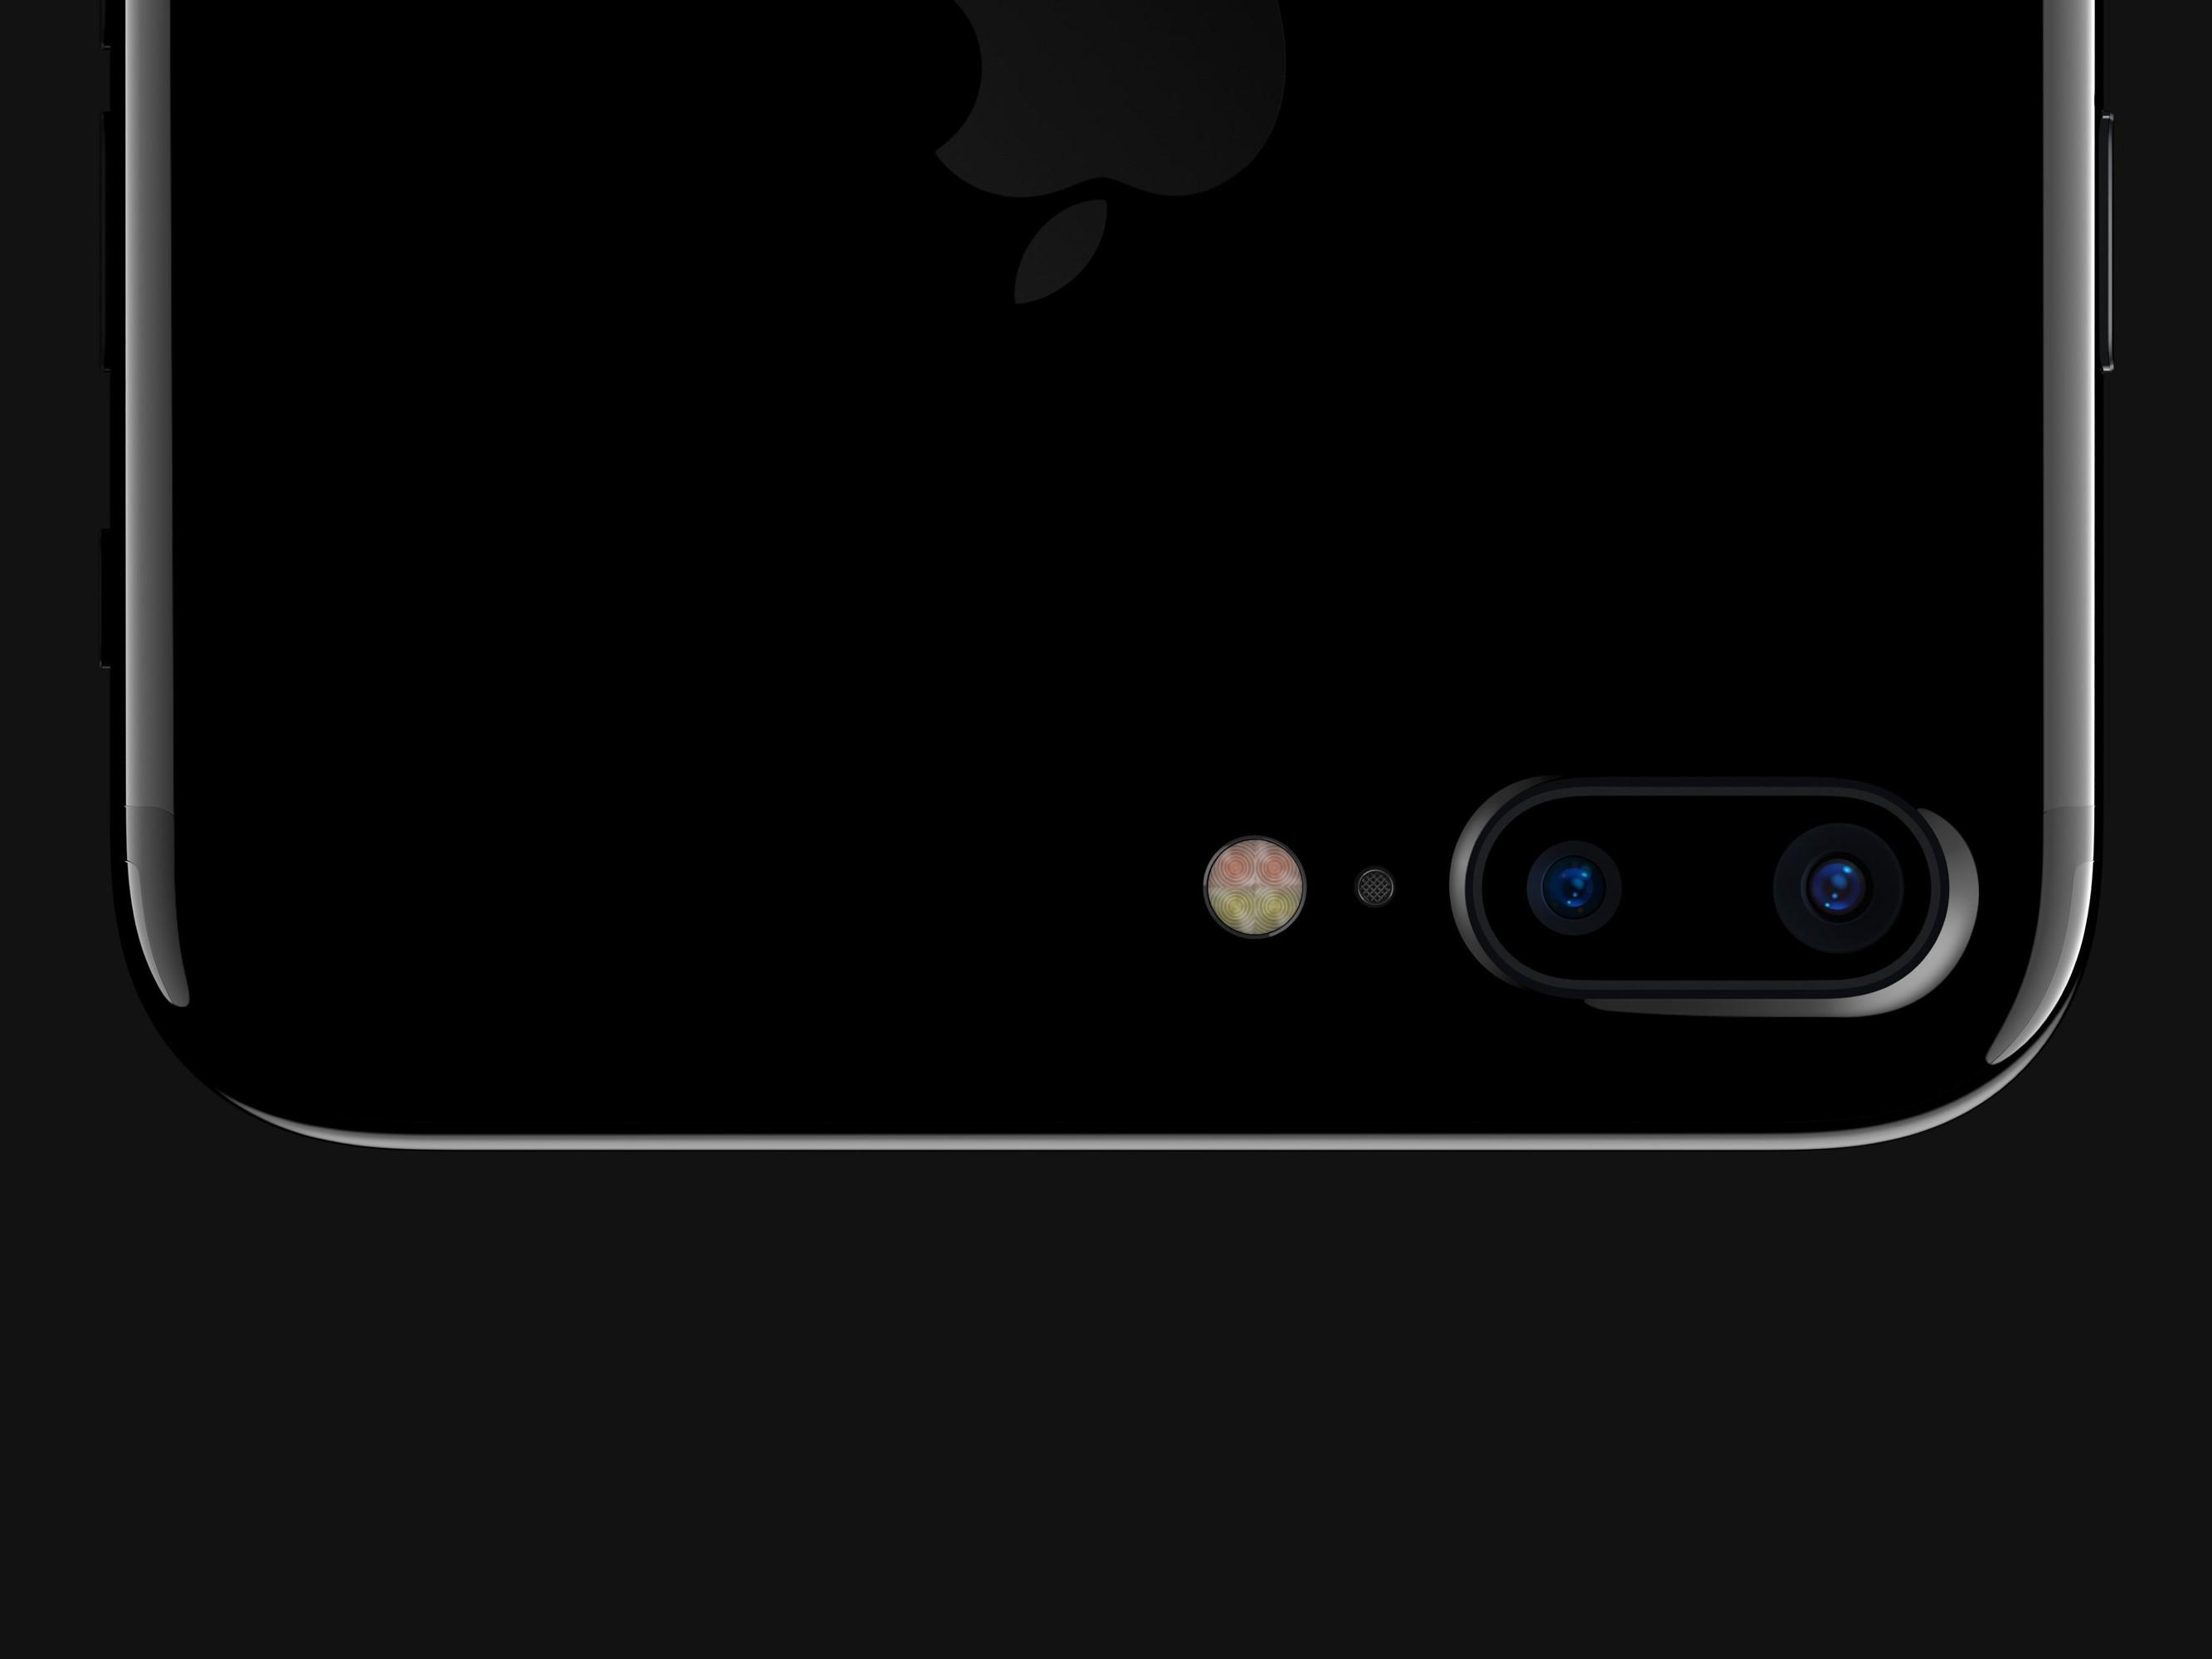 apple手机iphone智苹果-双摄像头华为真伪手机v手机图片